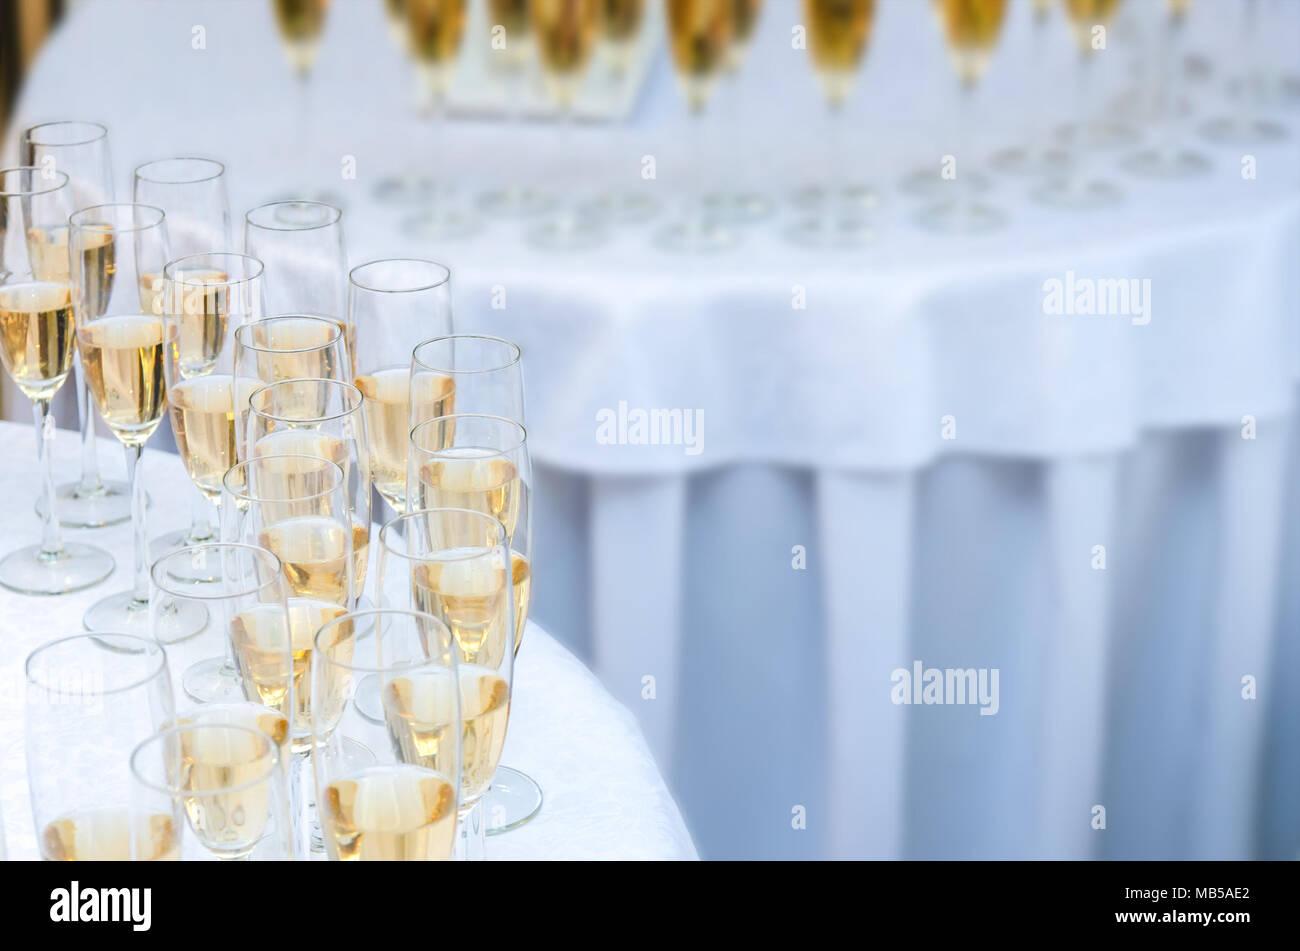 Un montón de copas de vino con una botella de champán o vino blanco sobre la mesa redonda. Antecedentes de alcohol Imagen De Stock